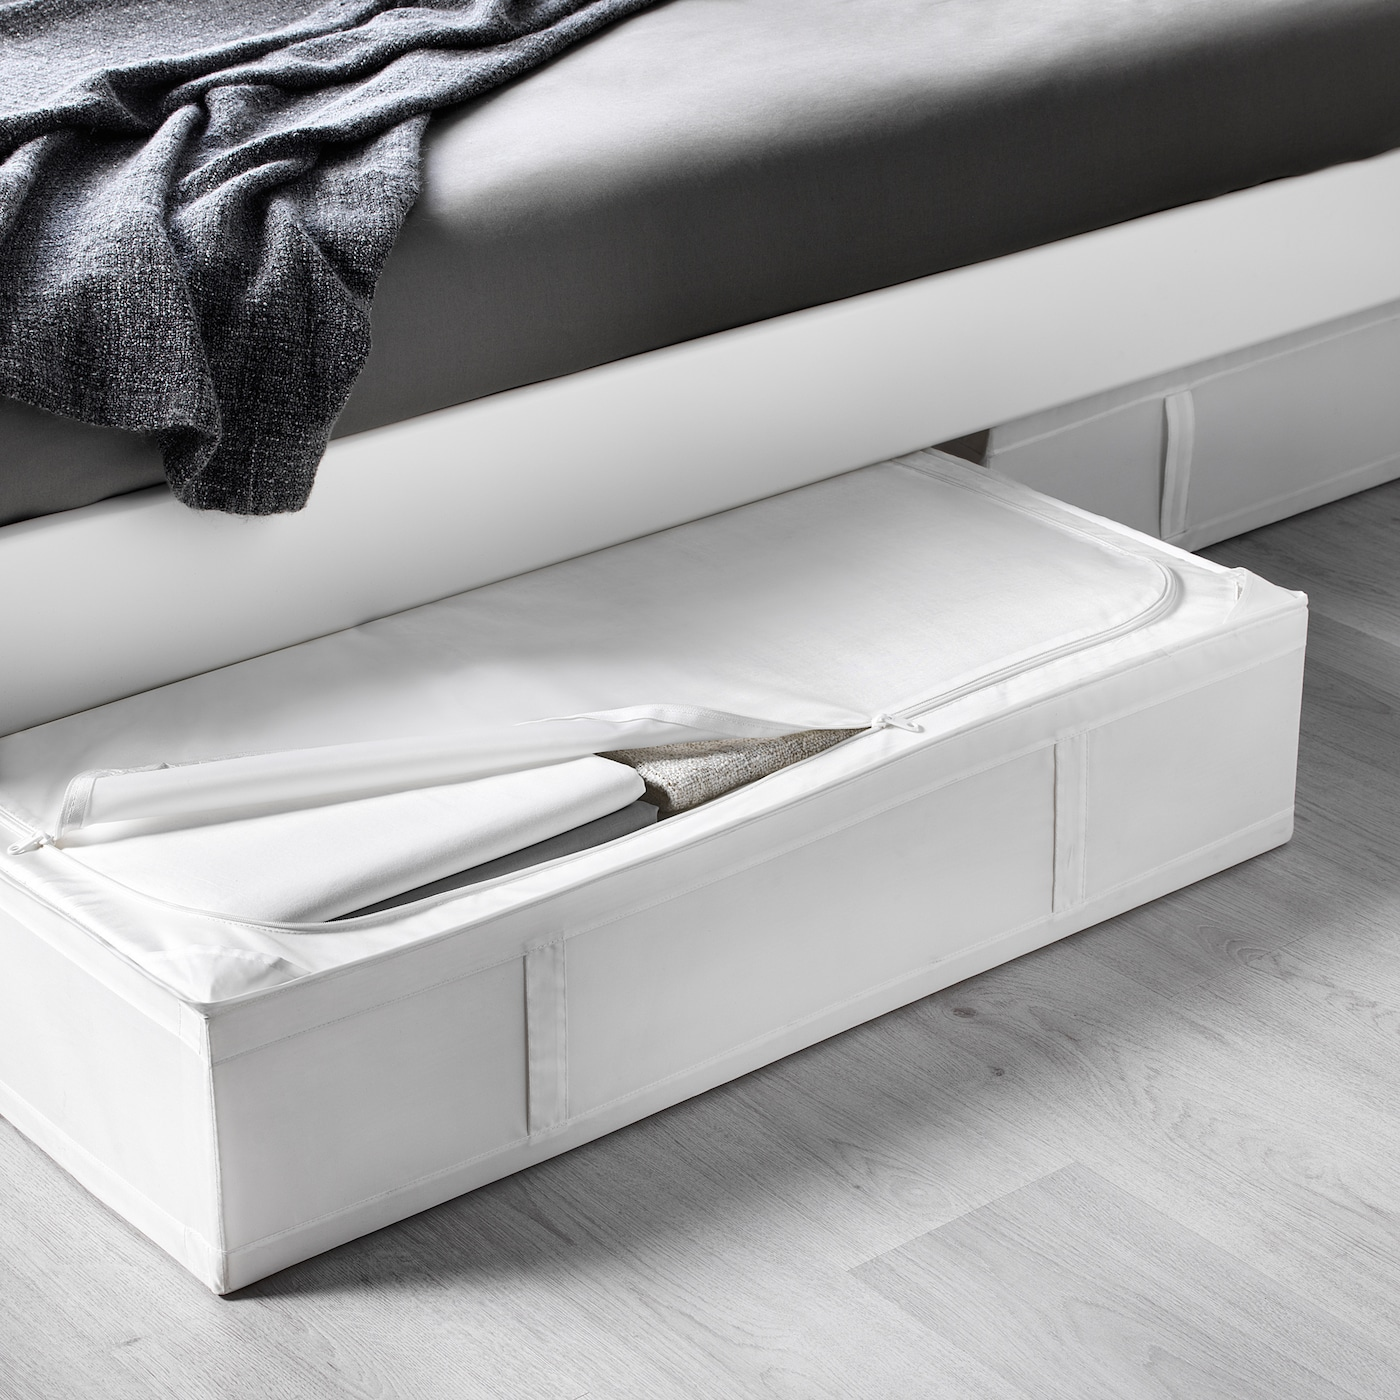 /Storage with 9/compartments White/ IKEA SKUBB/ /22x34x120/cm